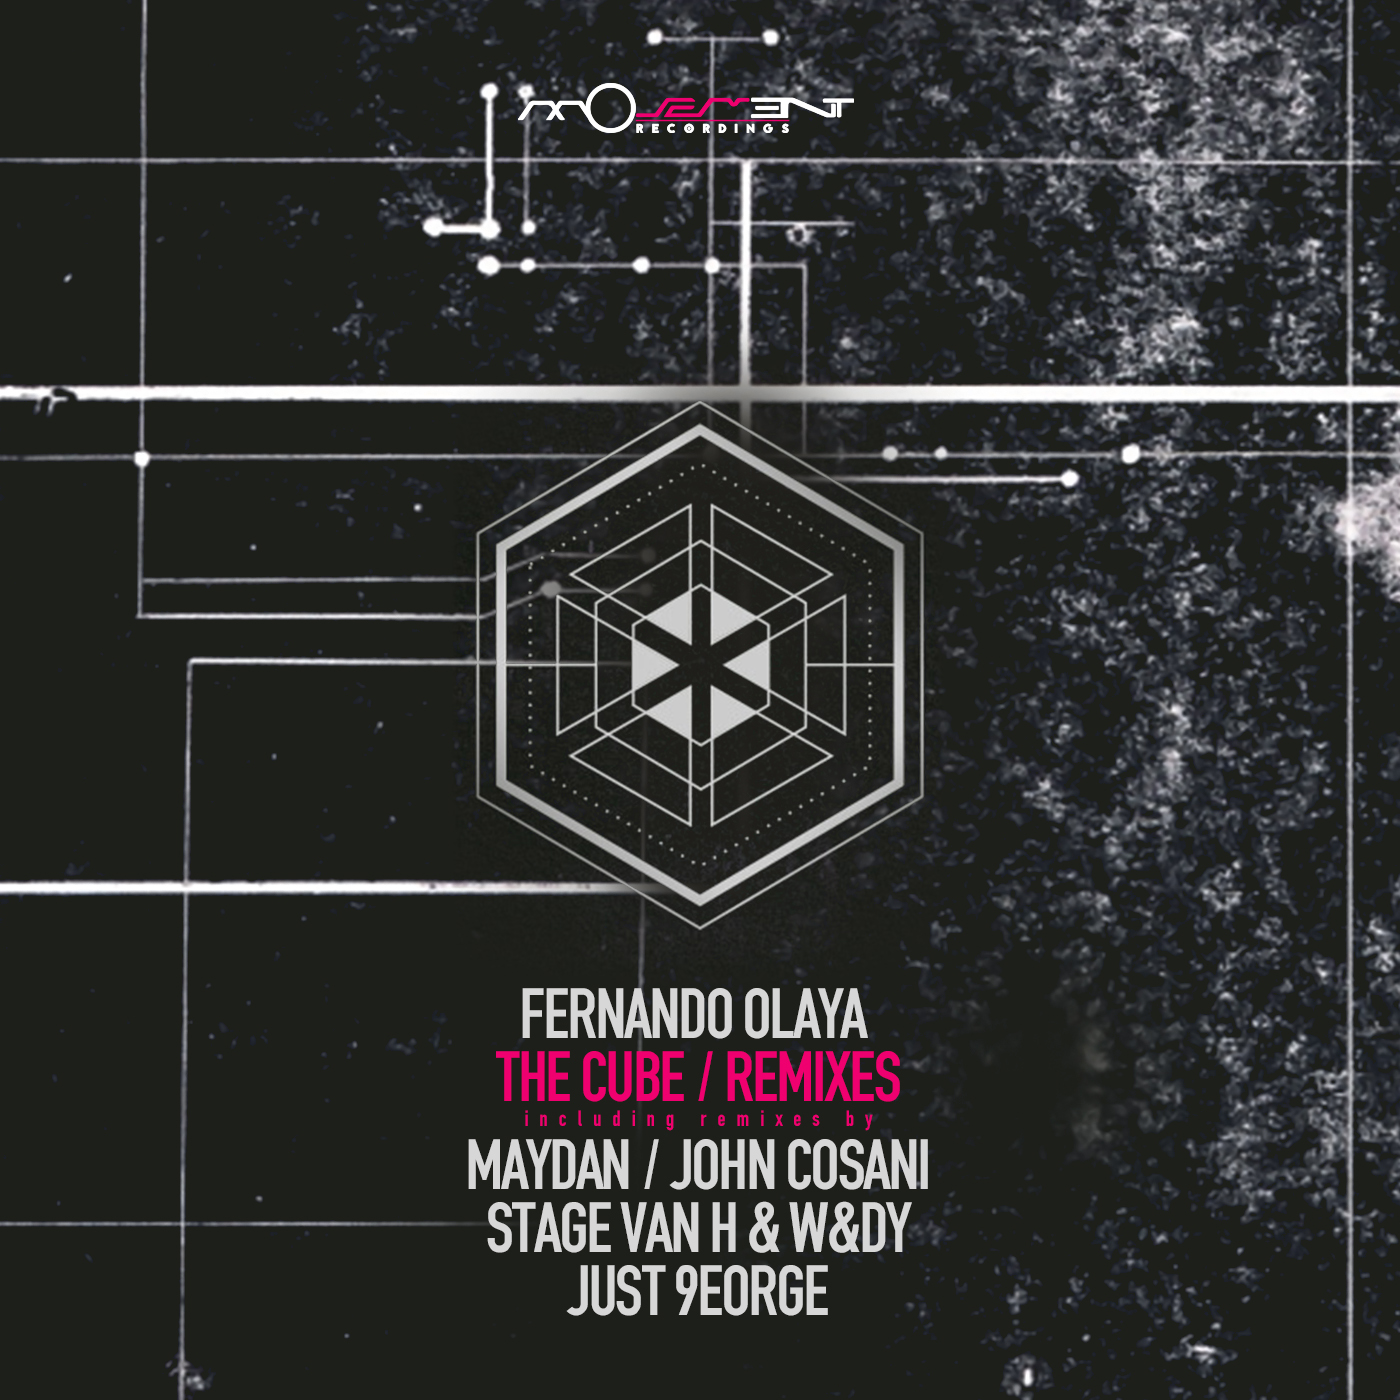 Fernando Olaya - The Cube Remixes (Movement Recordings)